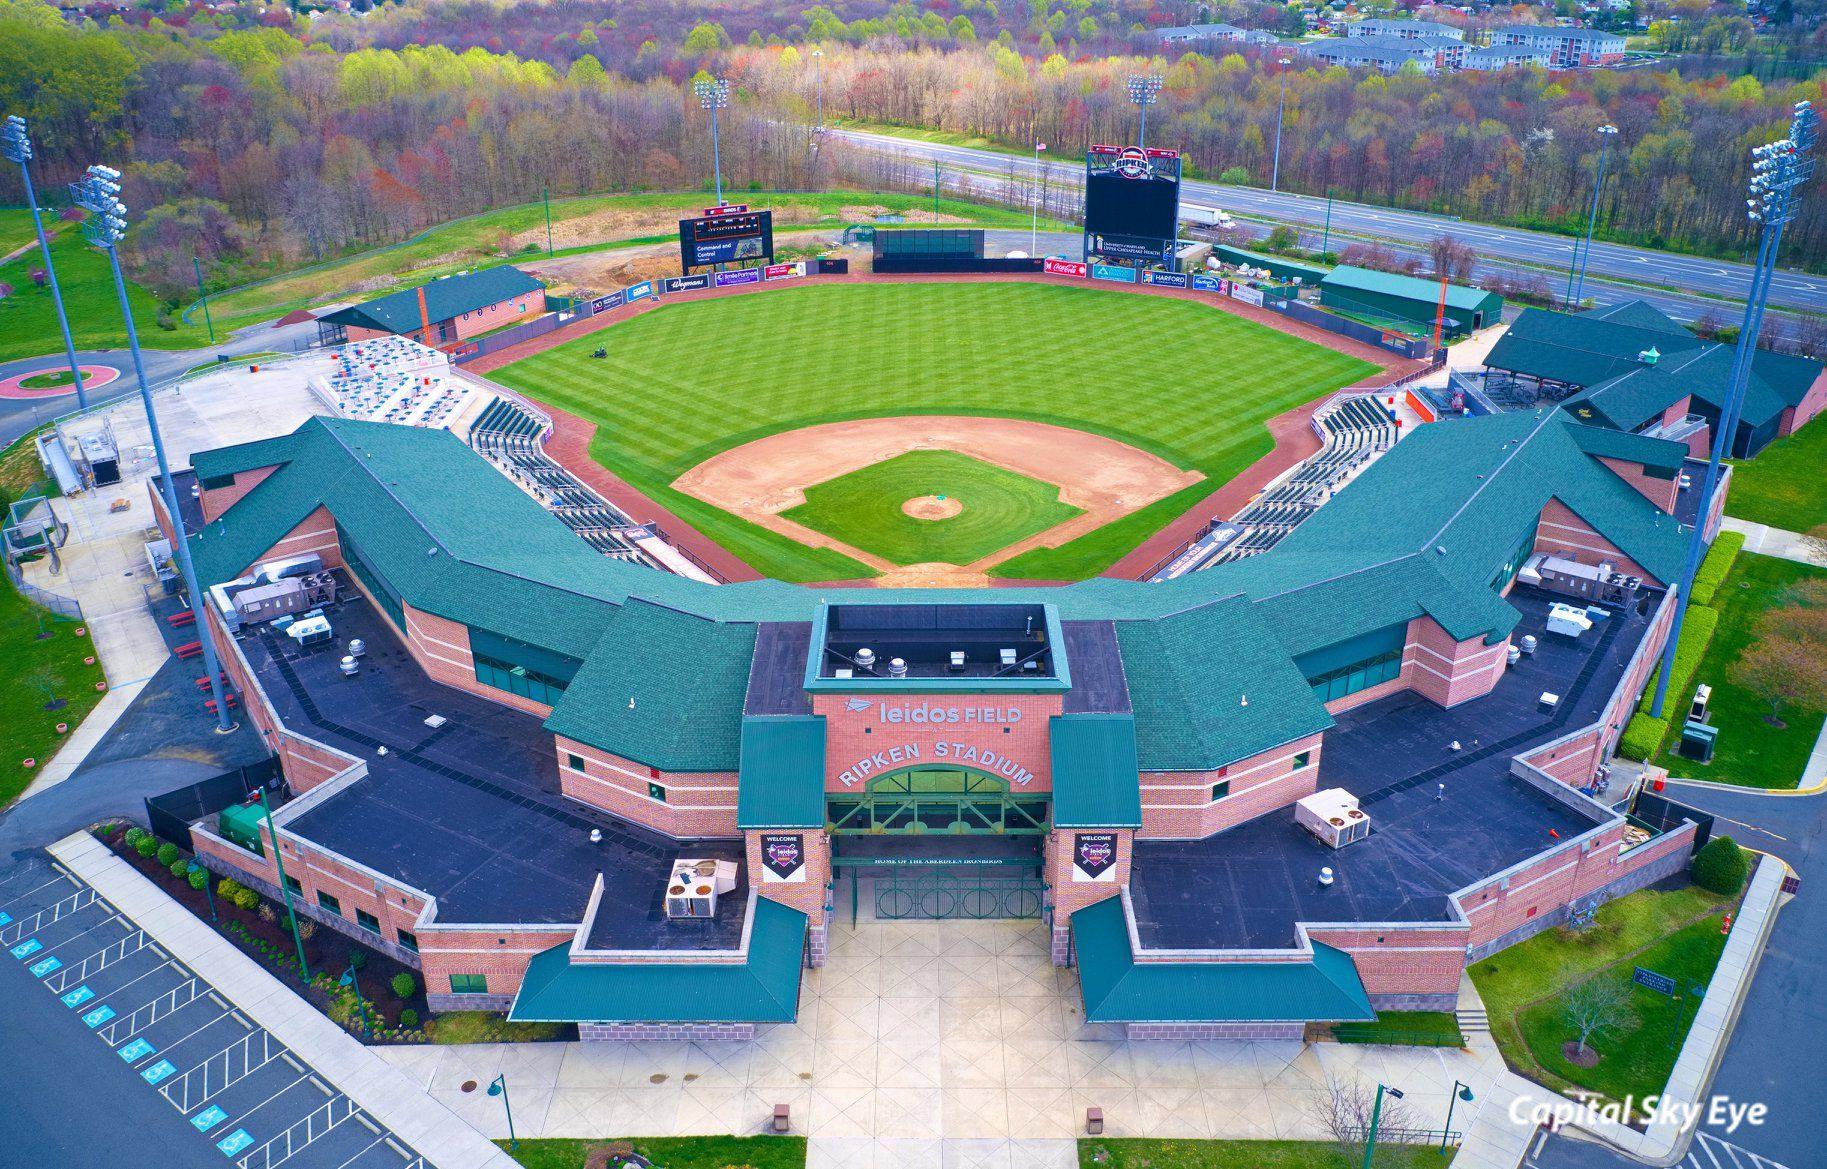 Harford County Maryland Aberdeen Cal Ripken Baseball Stadium In 2020 Aberdeen Maryland Baseball Stadium Harford County